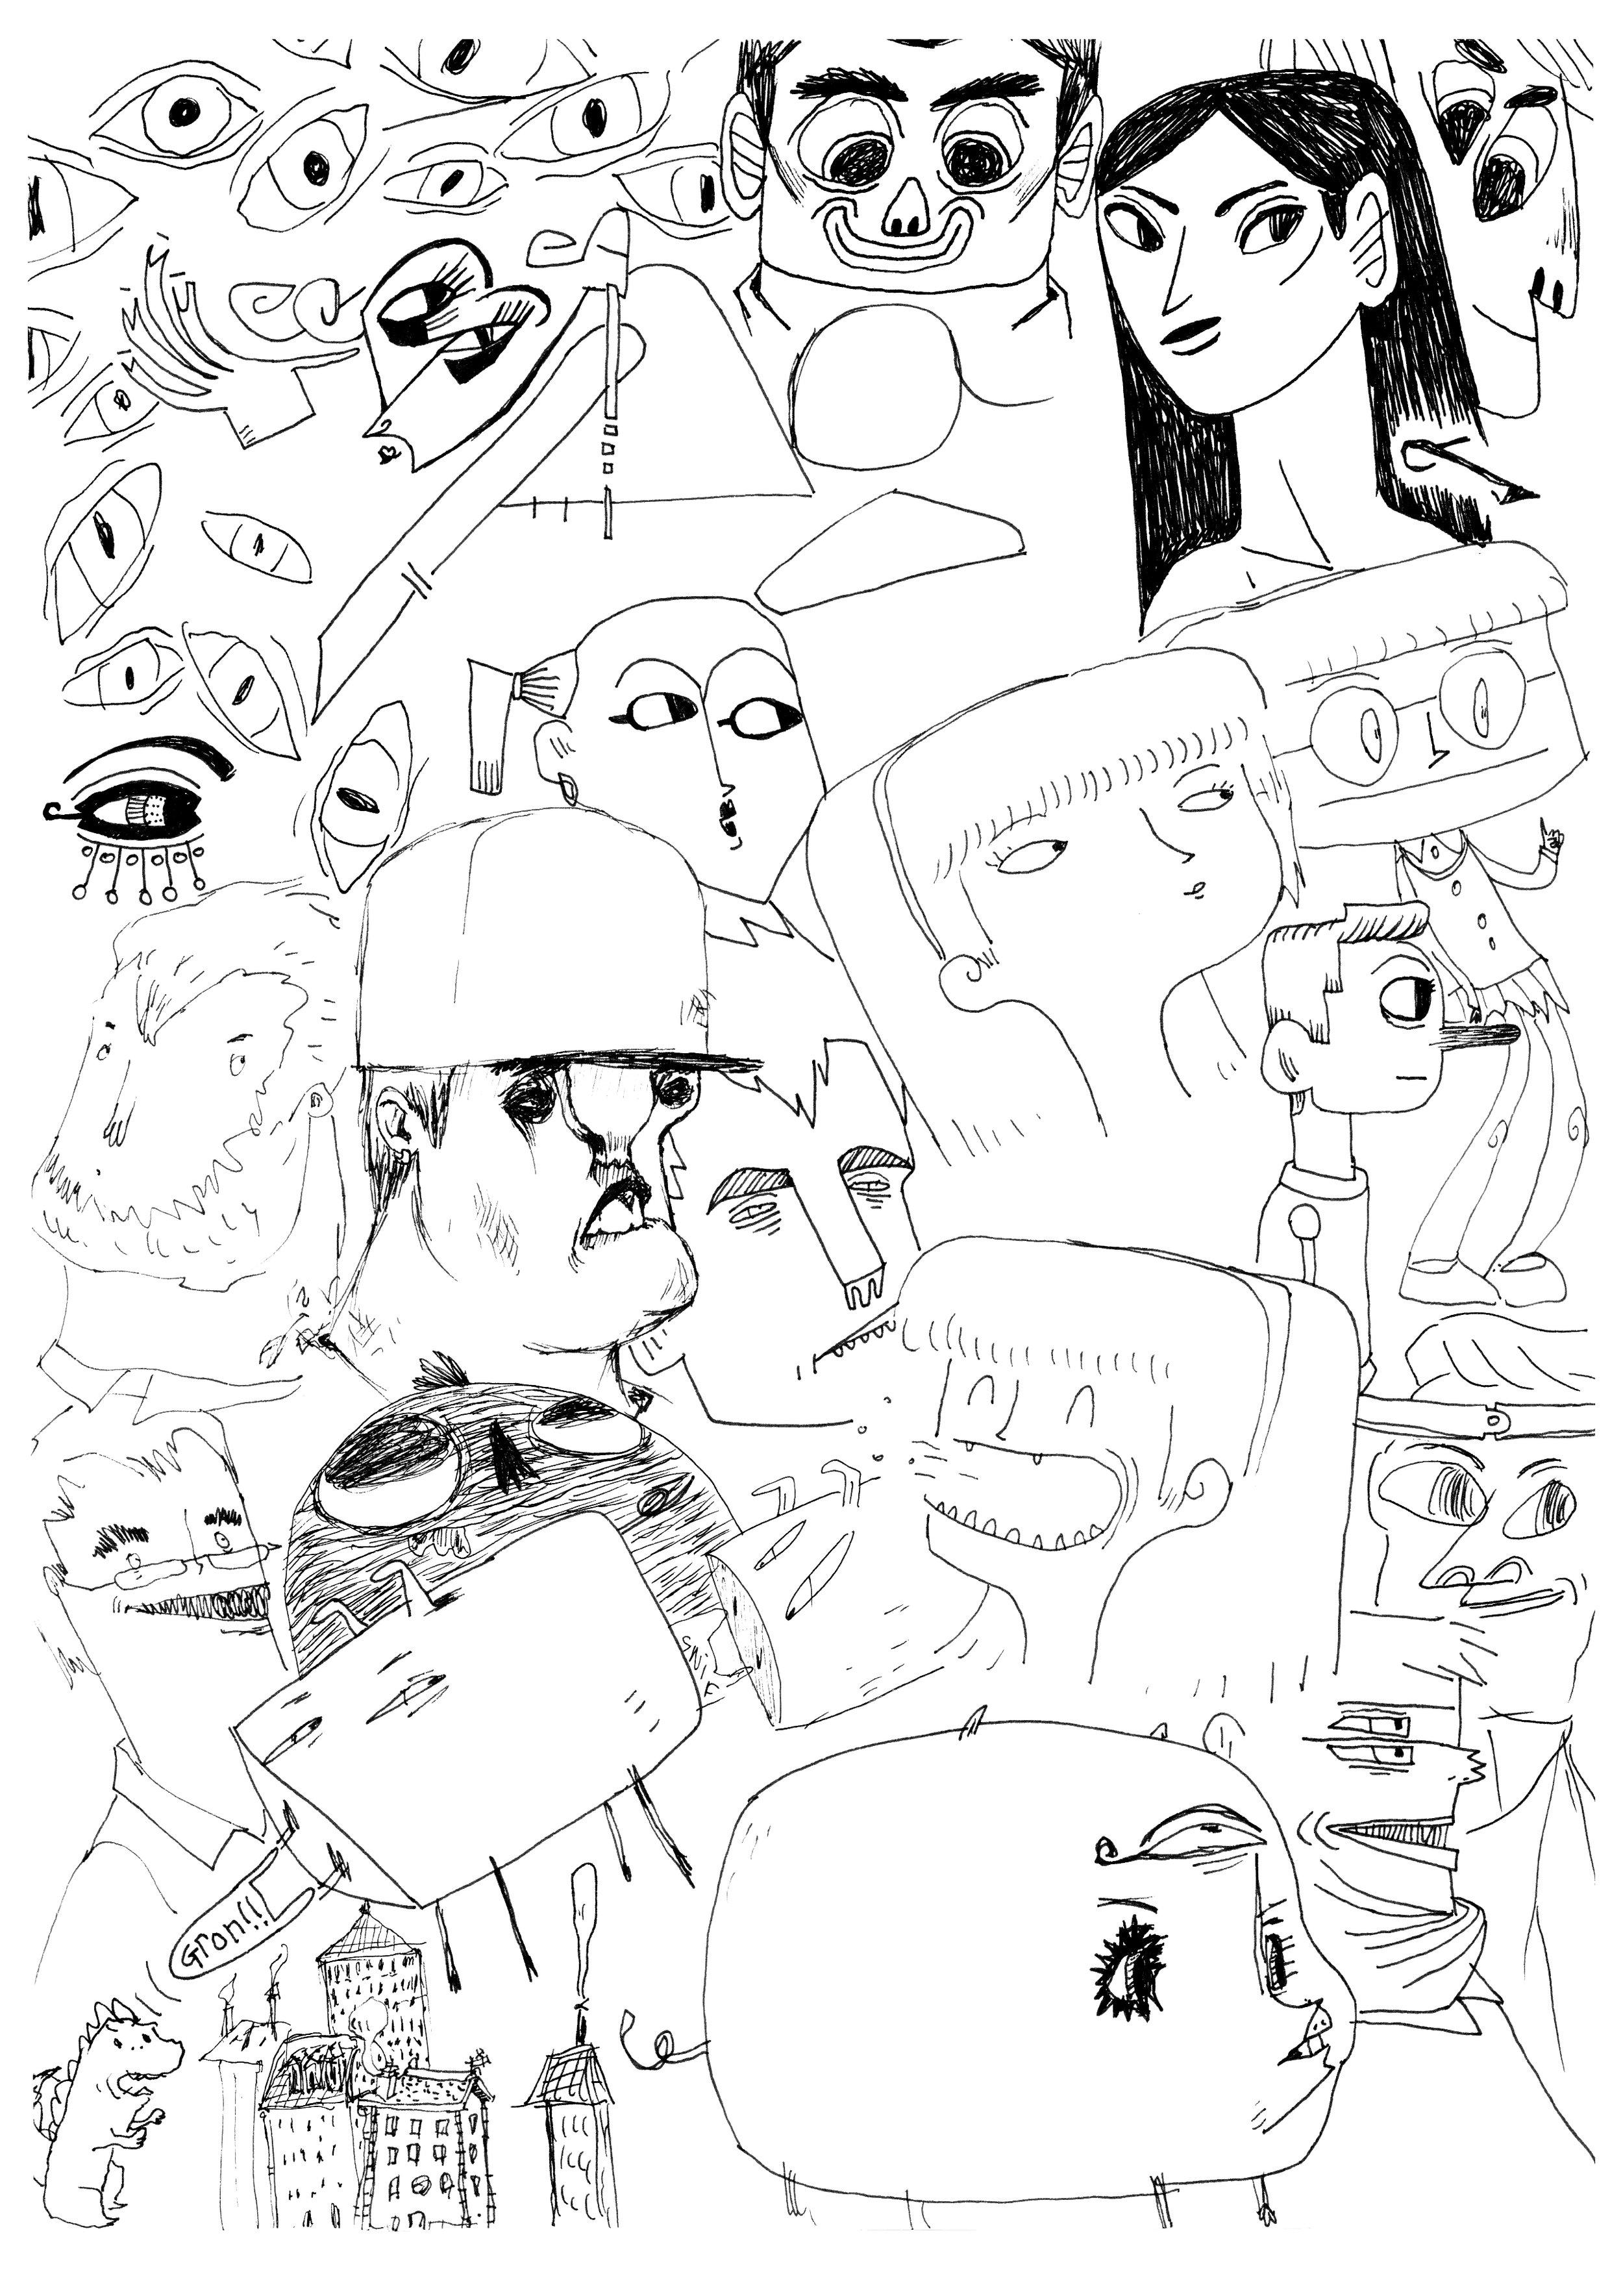 Pascal_Zaffiro_Doodle_34.jpg